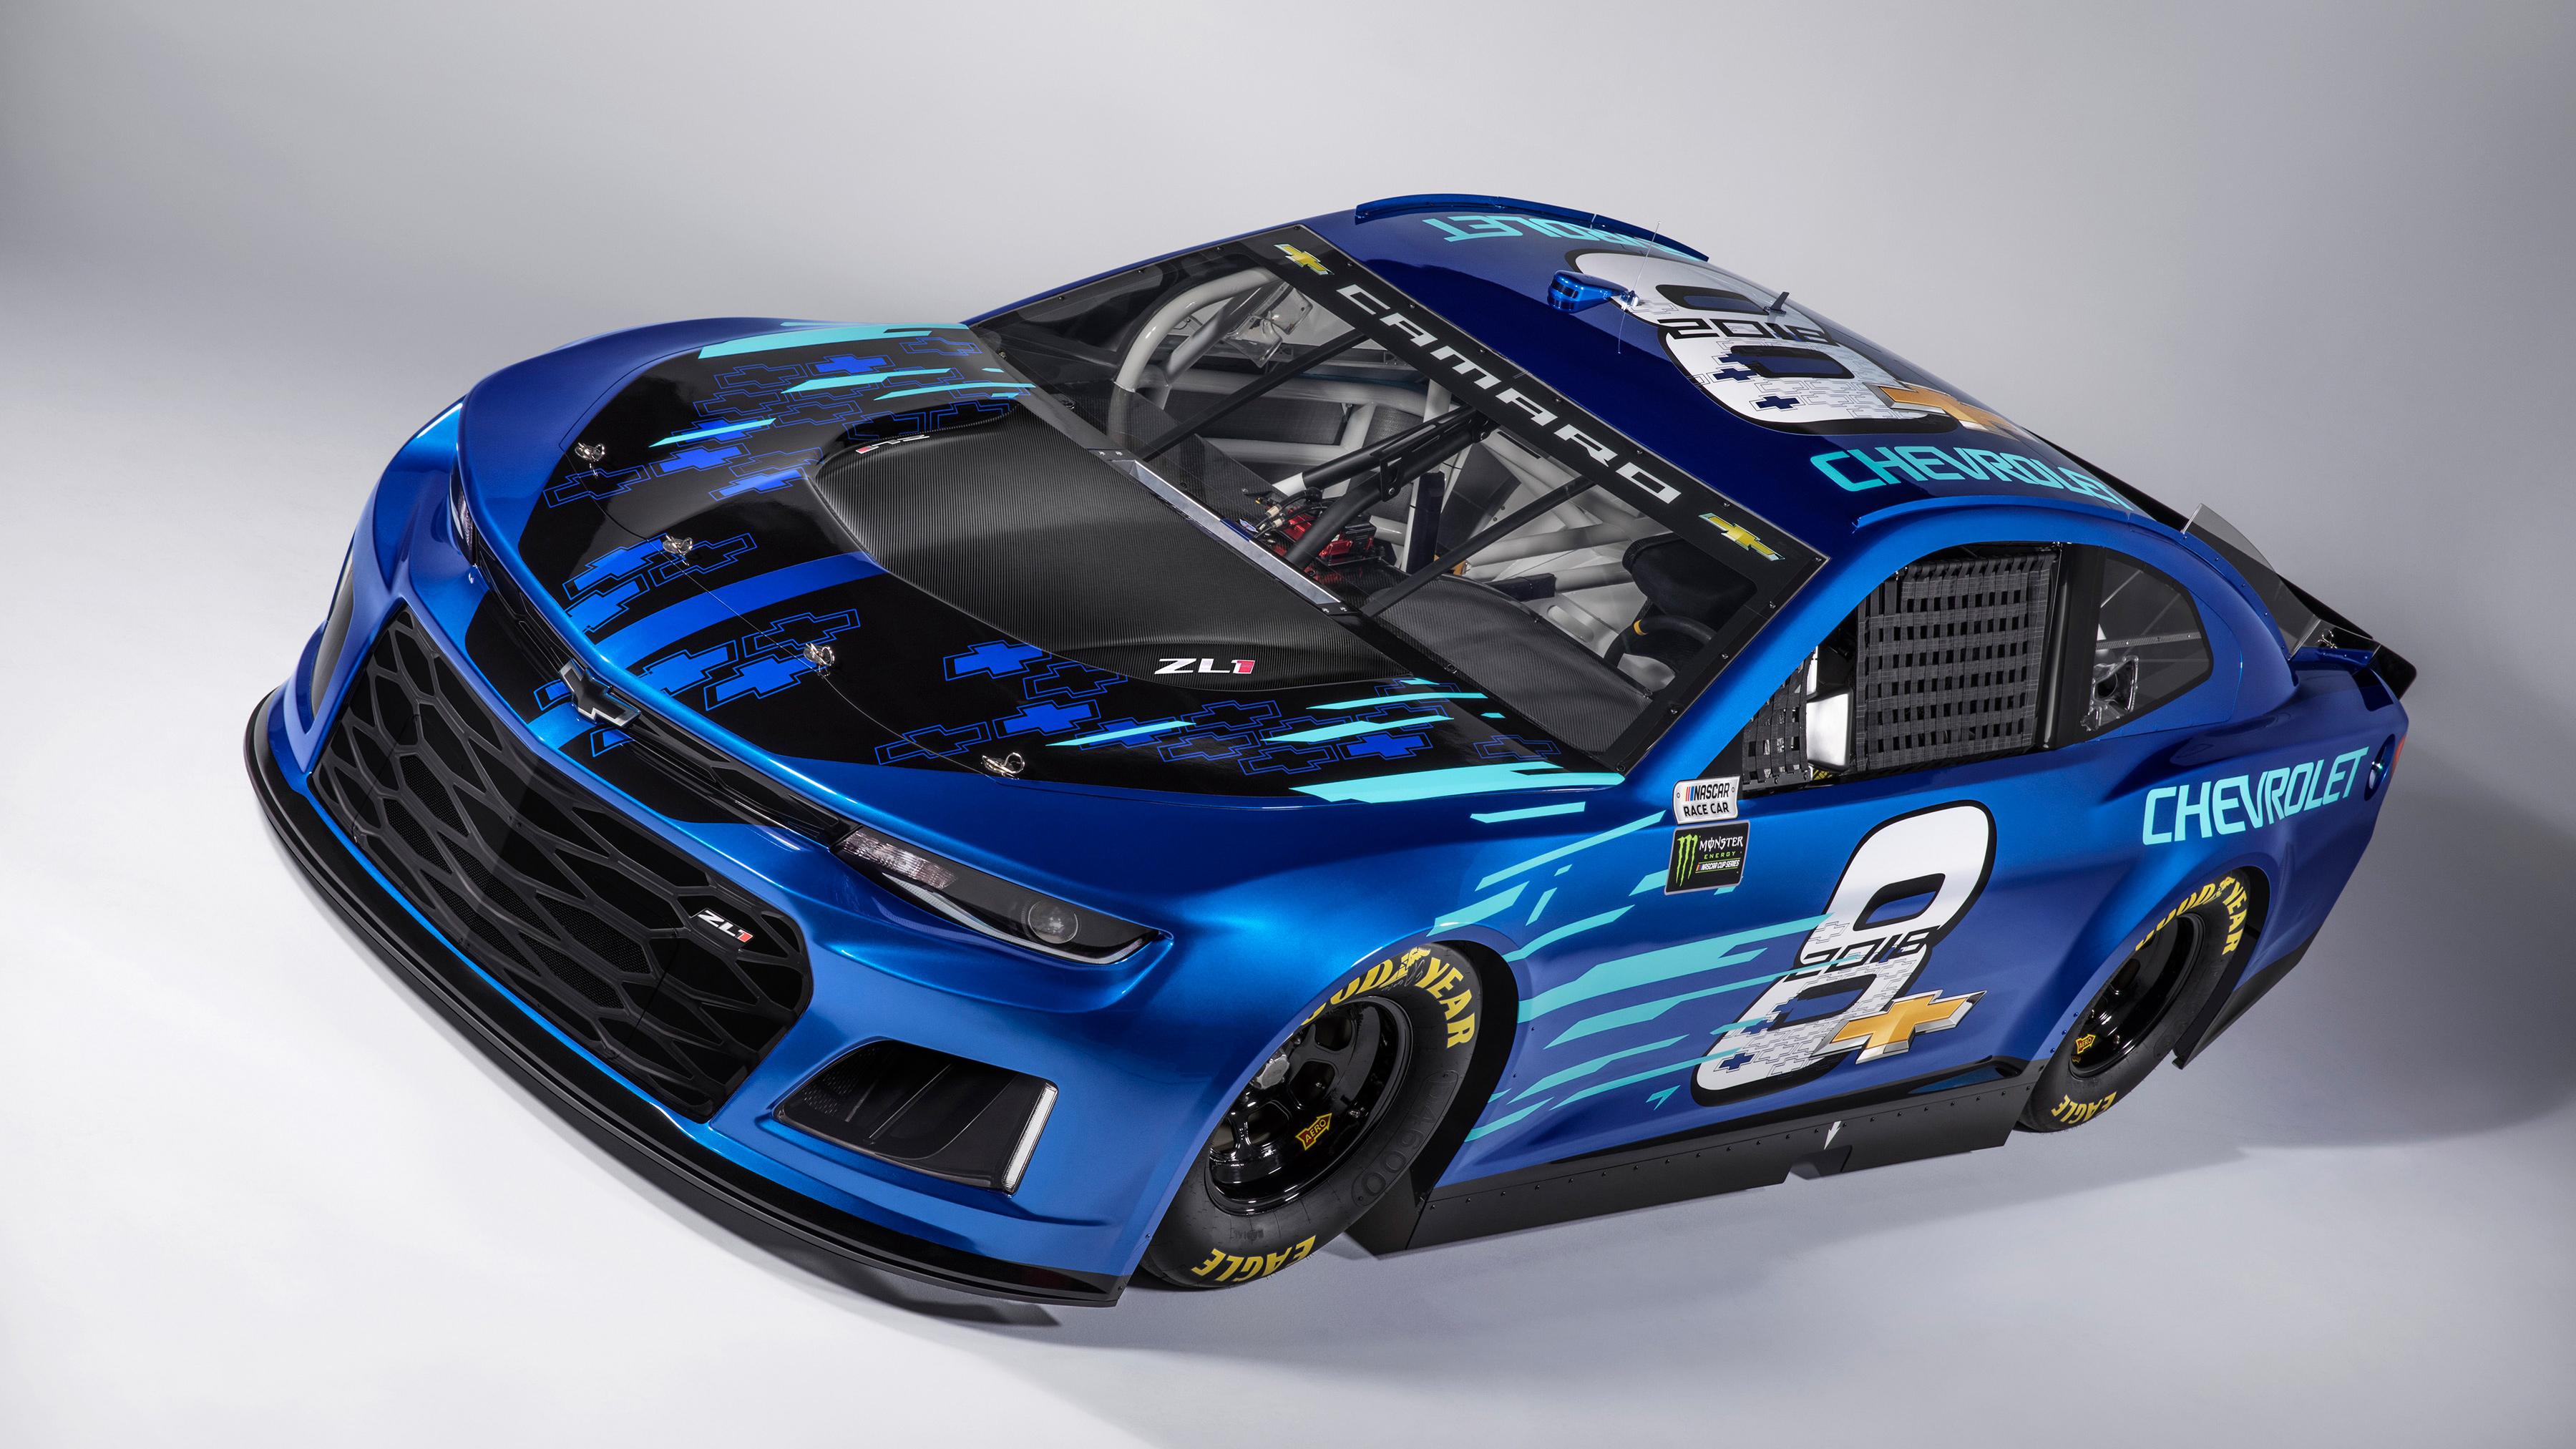 Chevrolet Camaro ZL1 NASCAR Race Car 2018 Wallpaper | HD Car Wallpapers